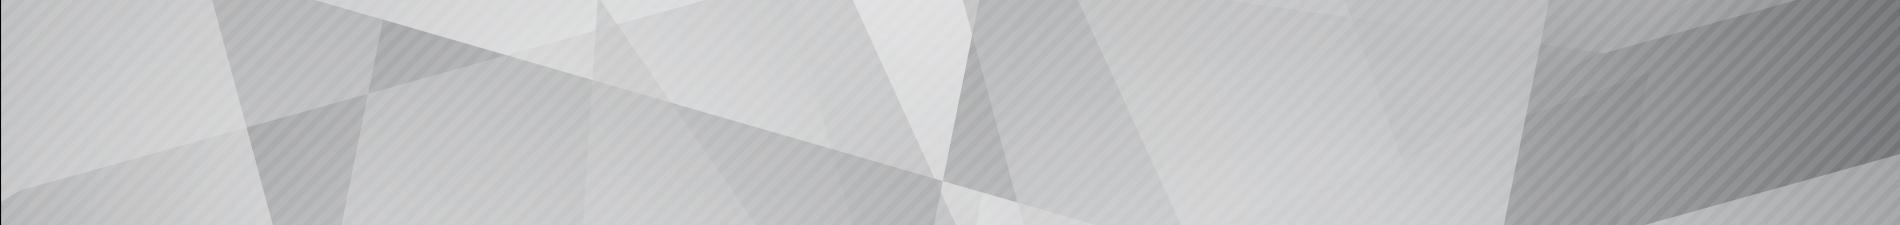 SP PINK RUN - 2017 - Imagem de topo